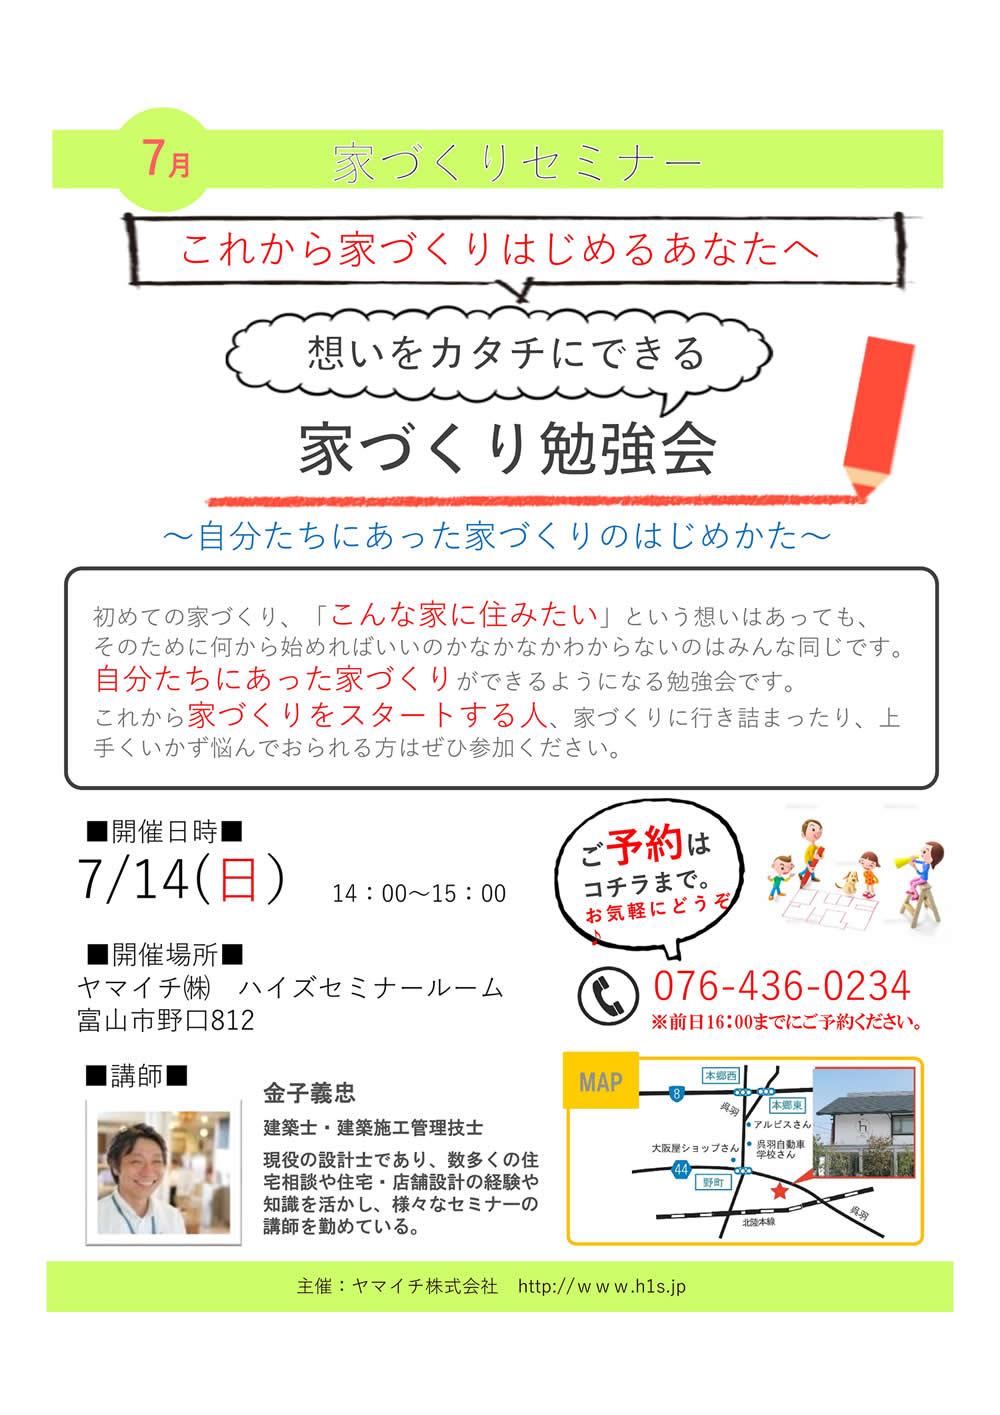 seminar-20190714